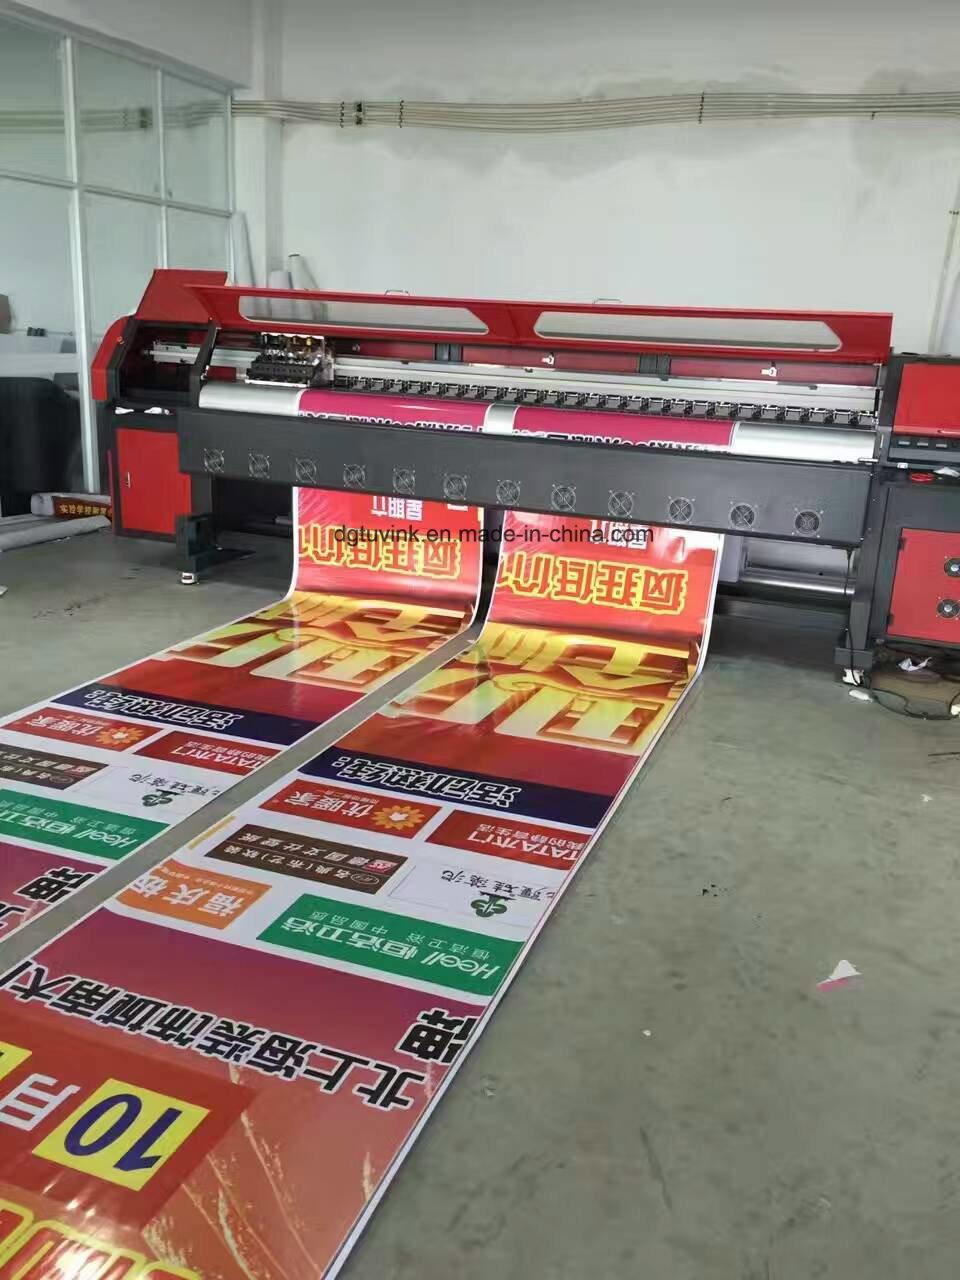 China 126inch wide format solvent digital advertising printing machine 4pcs 512i konica printhead flex banner vinyl sticker printer printer china